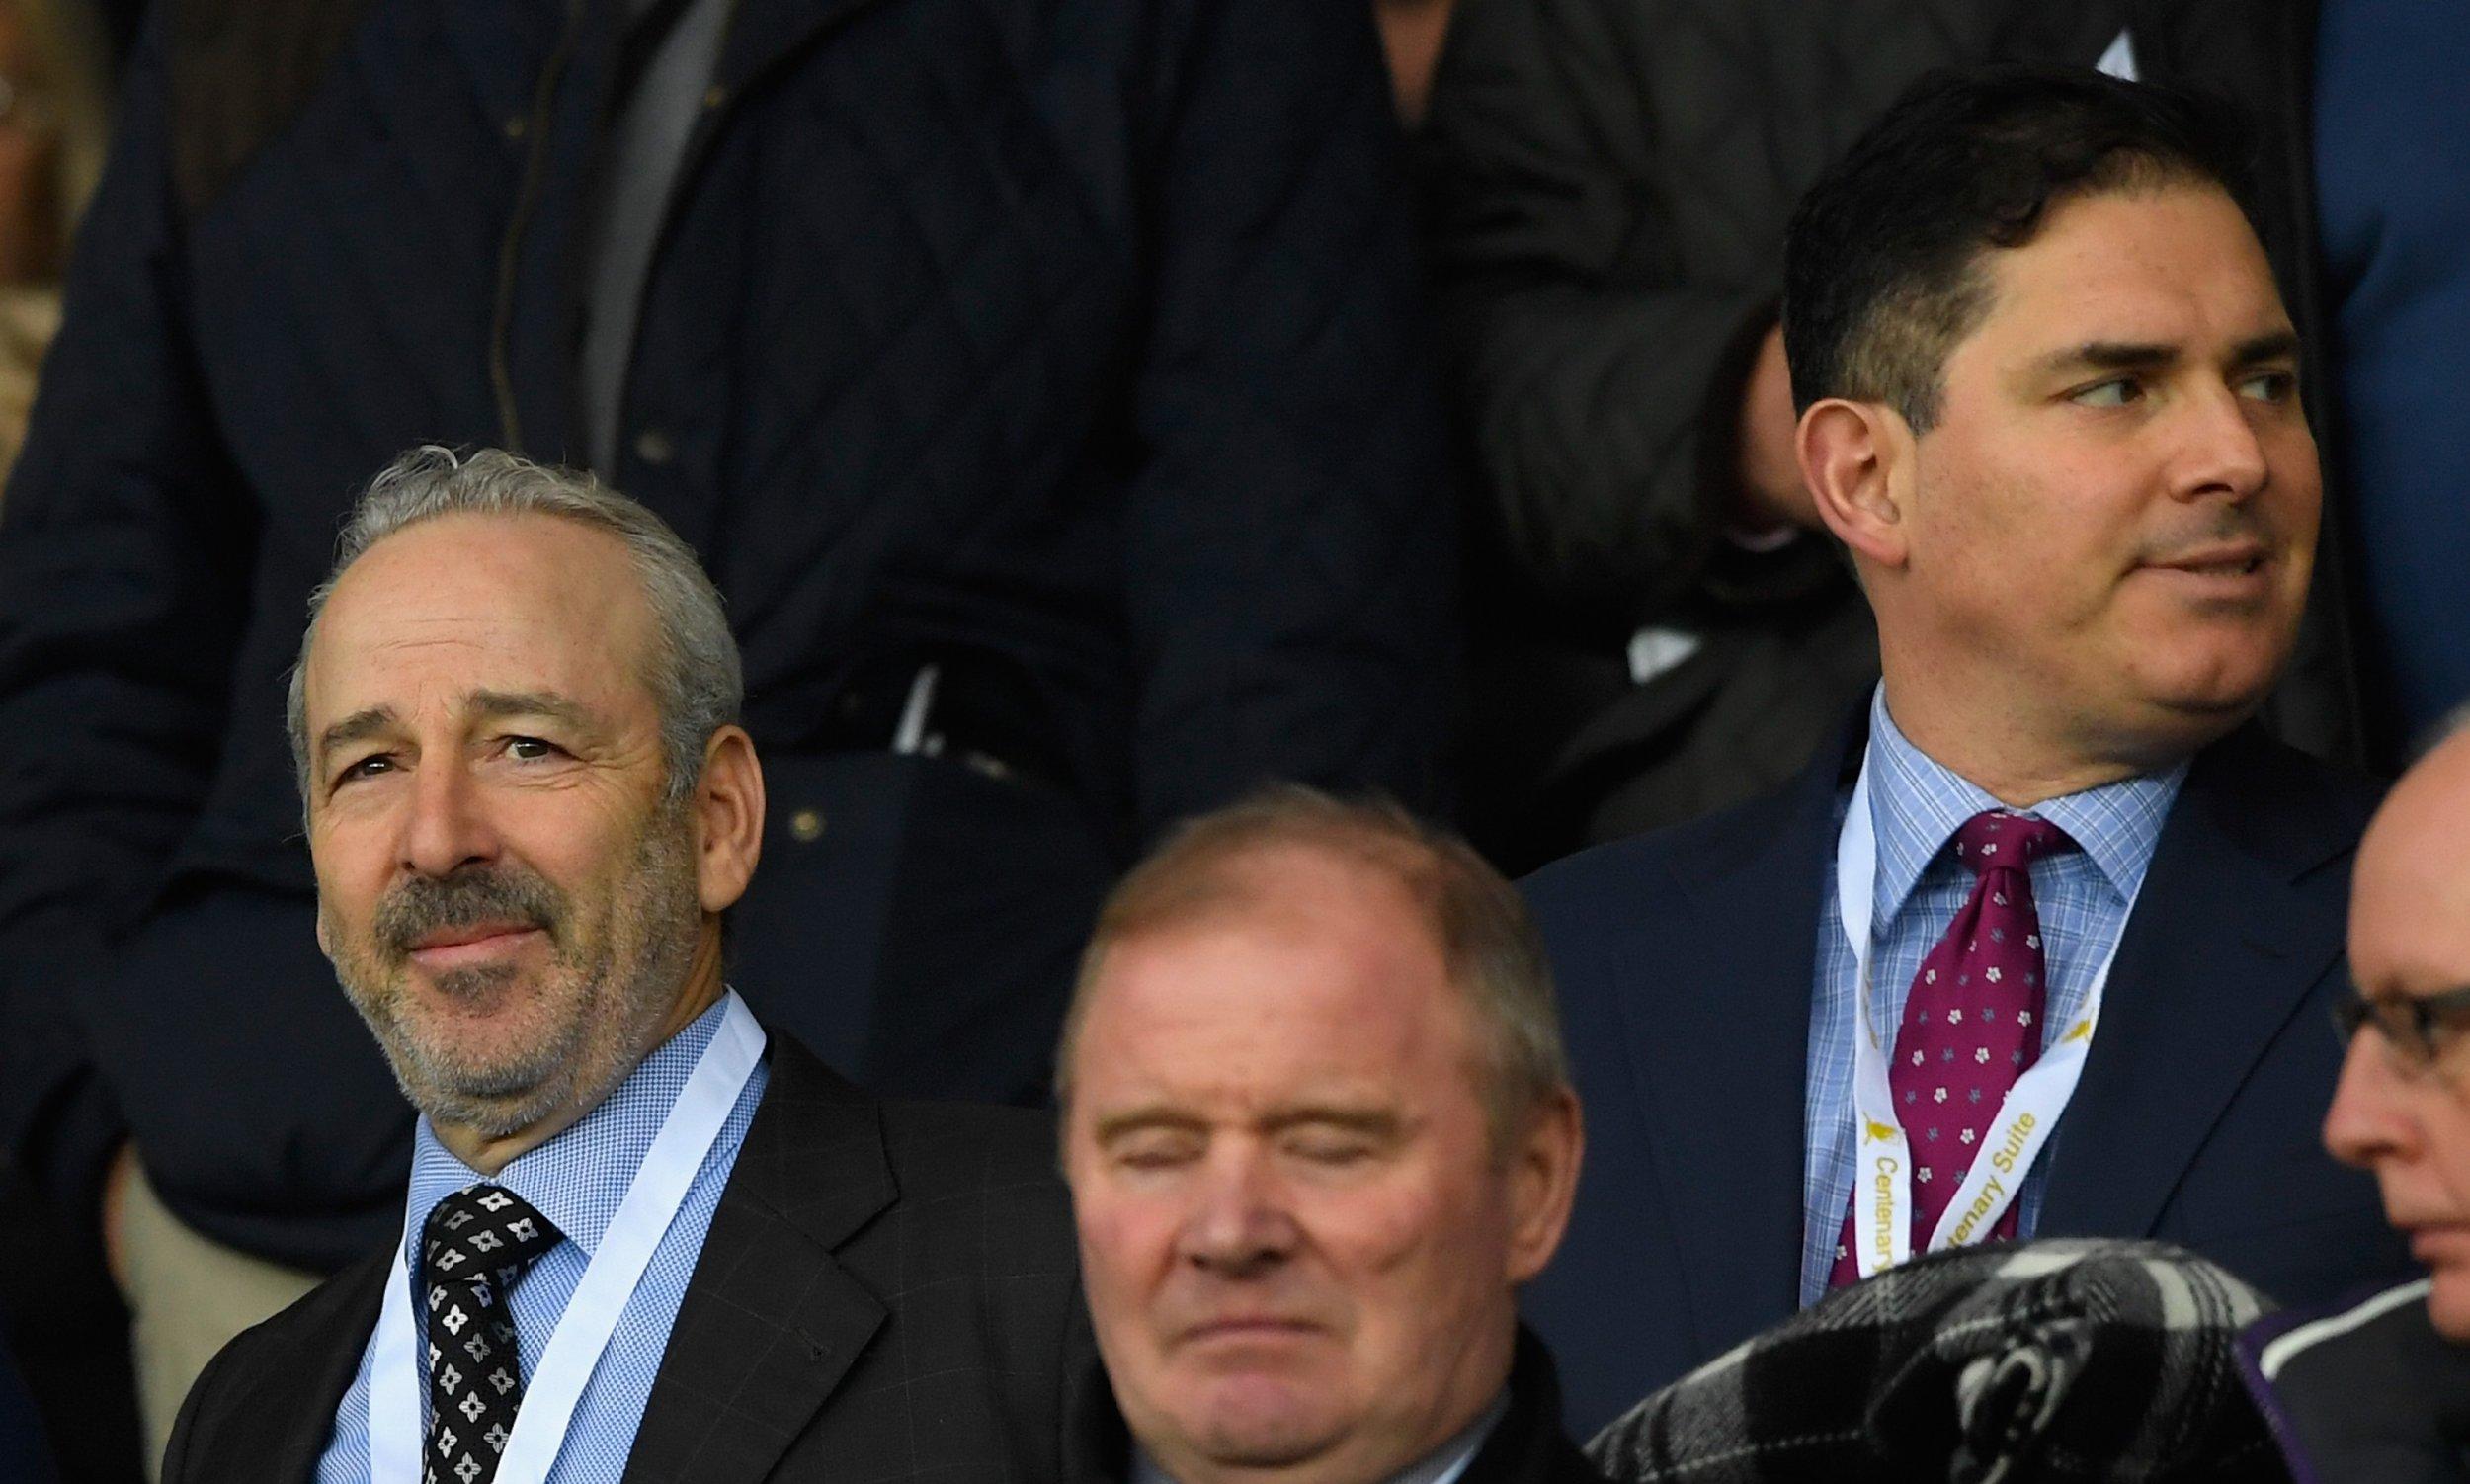 Swansea Majority Stakeholders